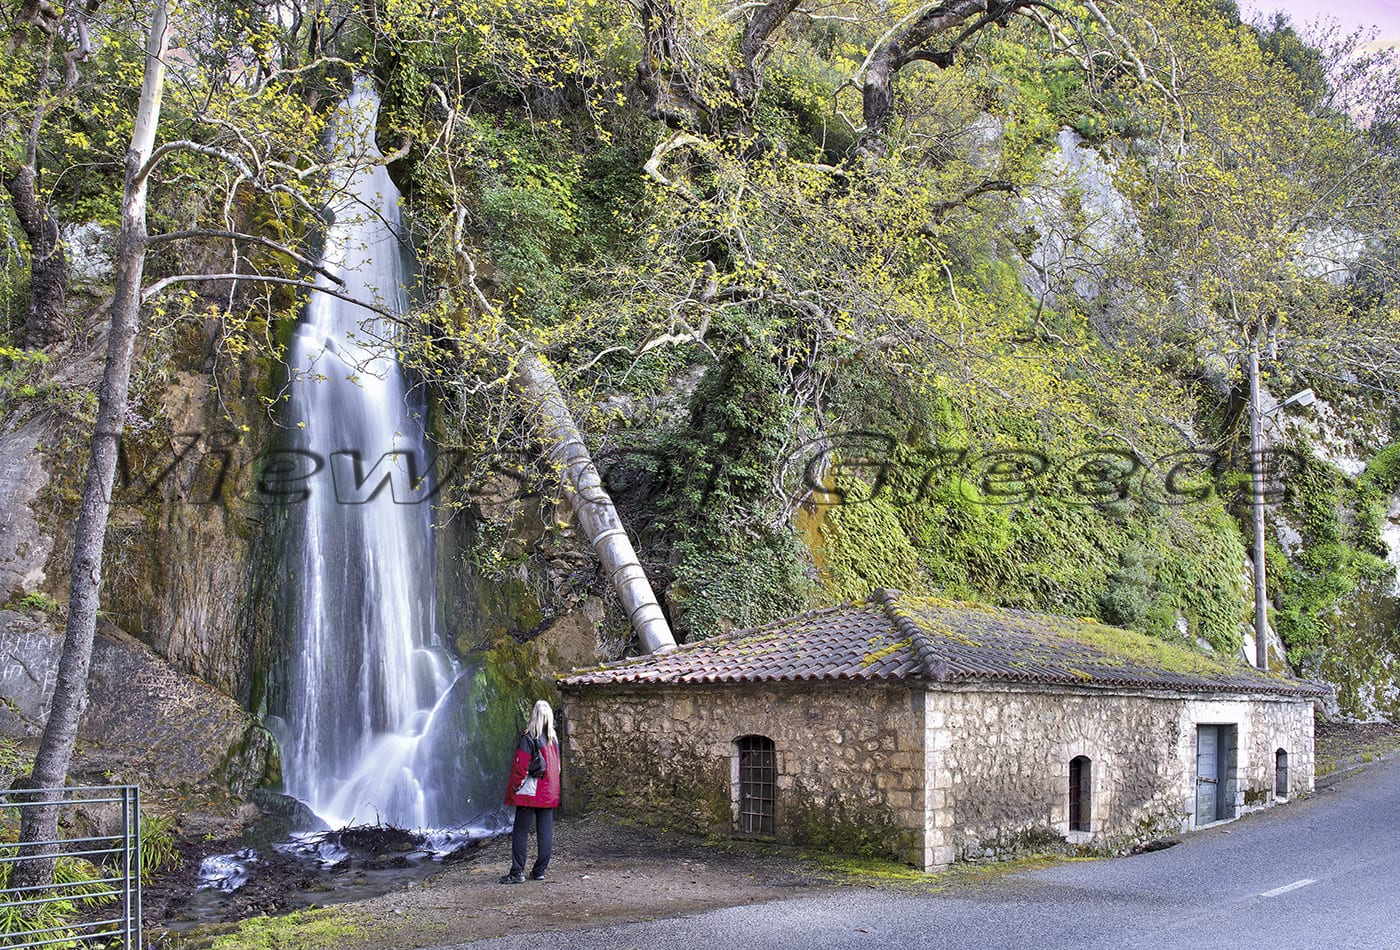 National Park Oiti, mountain, waterfalls, trekking, hiking, Εθνικός Δρυμός Οίτης, λιμνούλες Λιβαδιές, καταρράκτες, Αρσαλή, Υπάτη, Παύλιανη, Αγιοσπηλιές, μονή Αγάθωνος, χλωρίδα, Λουτρά Υπάτης, κάστρο Υπάτης,